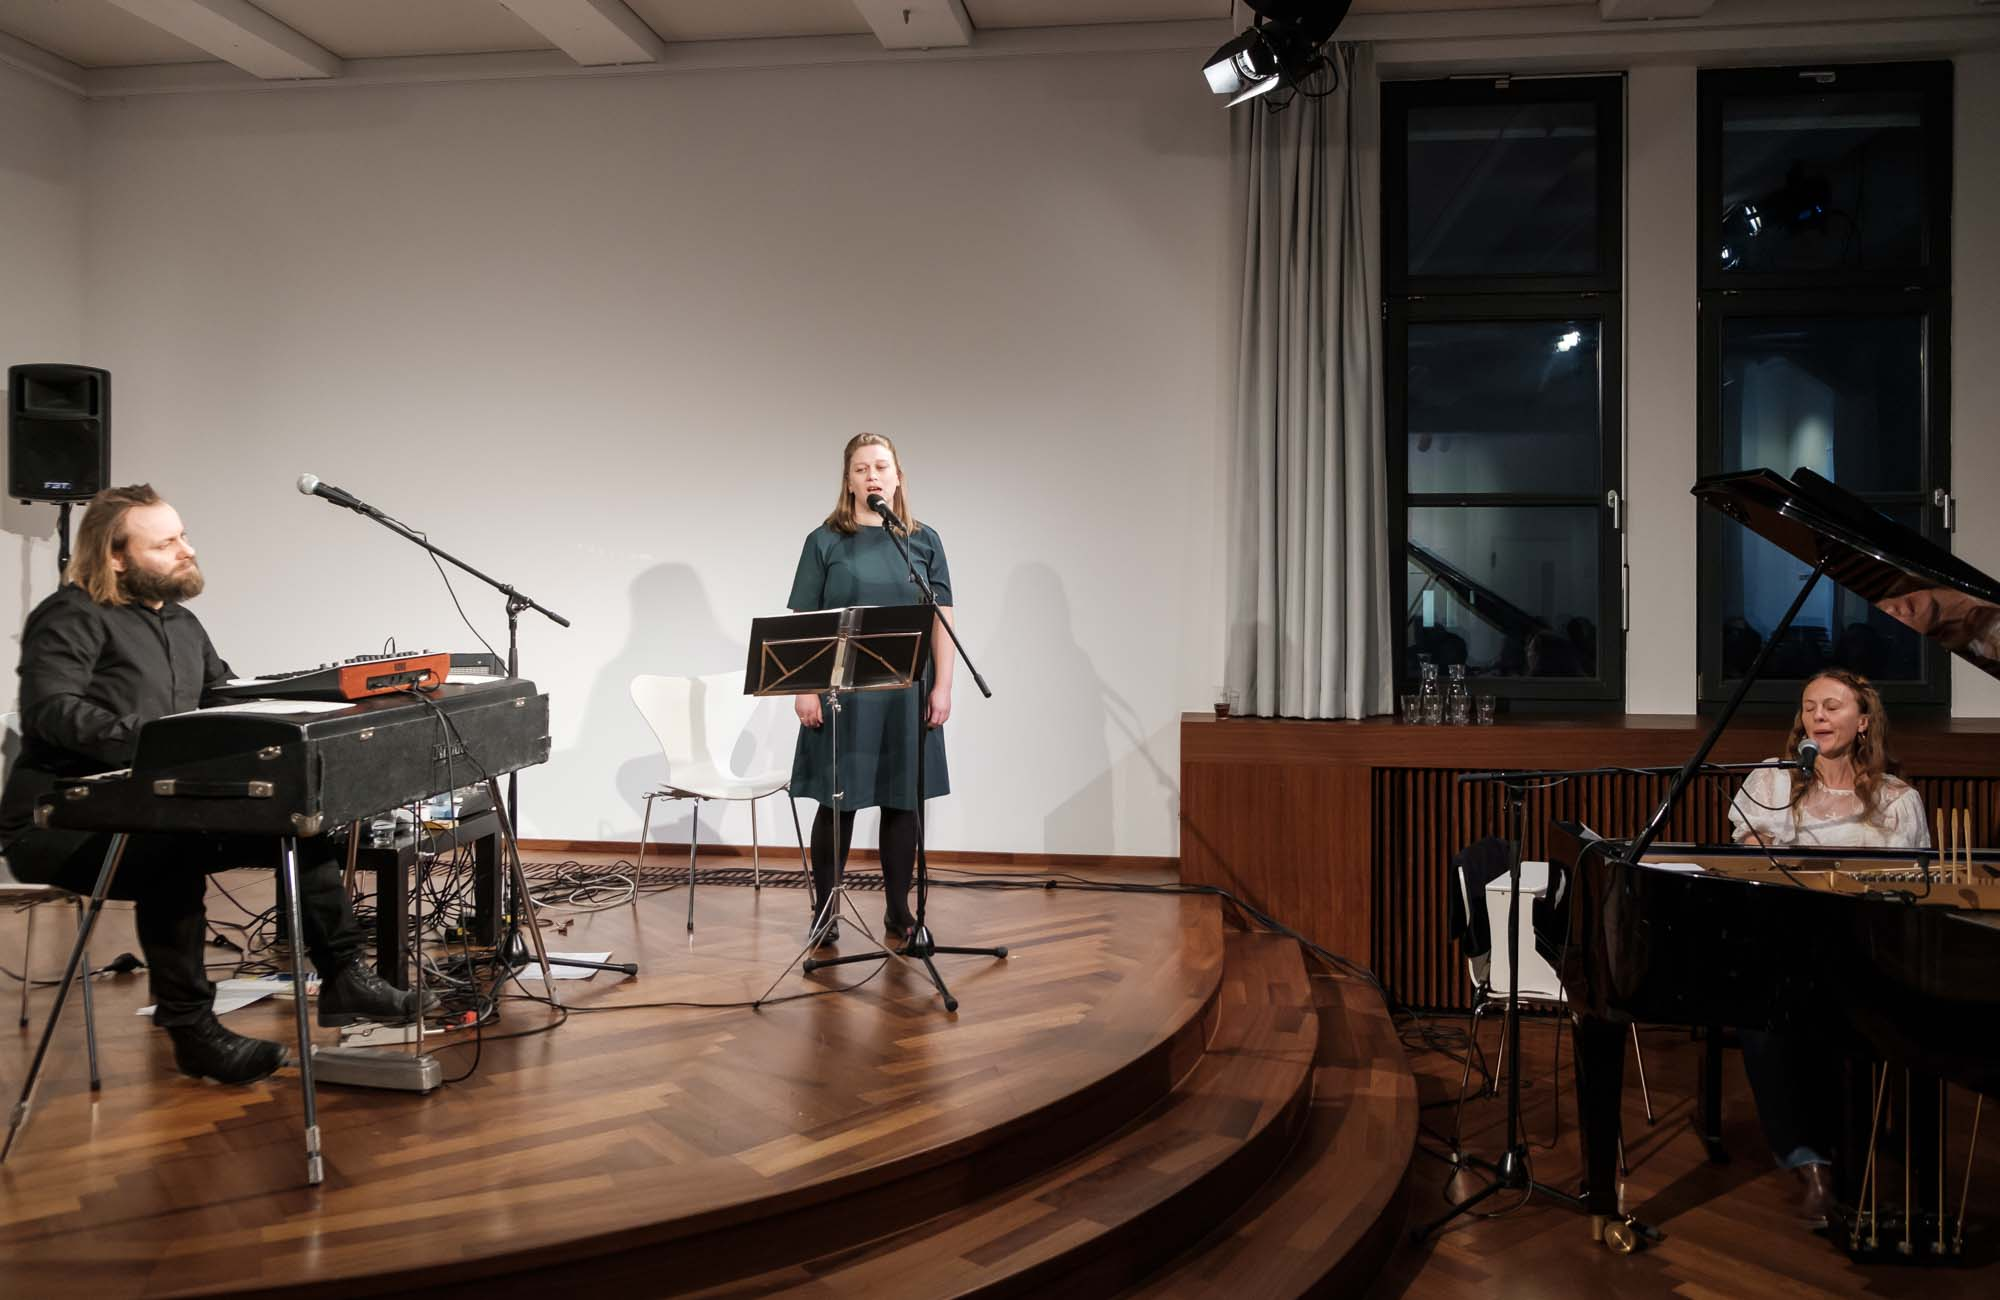 Russudan Meipariani, Aashild Vertus, Andreas Ulvo: Trio NorgeO: Klang & Poesie, nordöstlich <br/>(c) Sebastian Wenzel